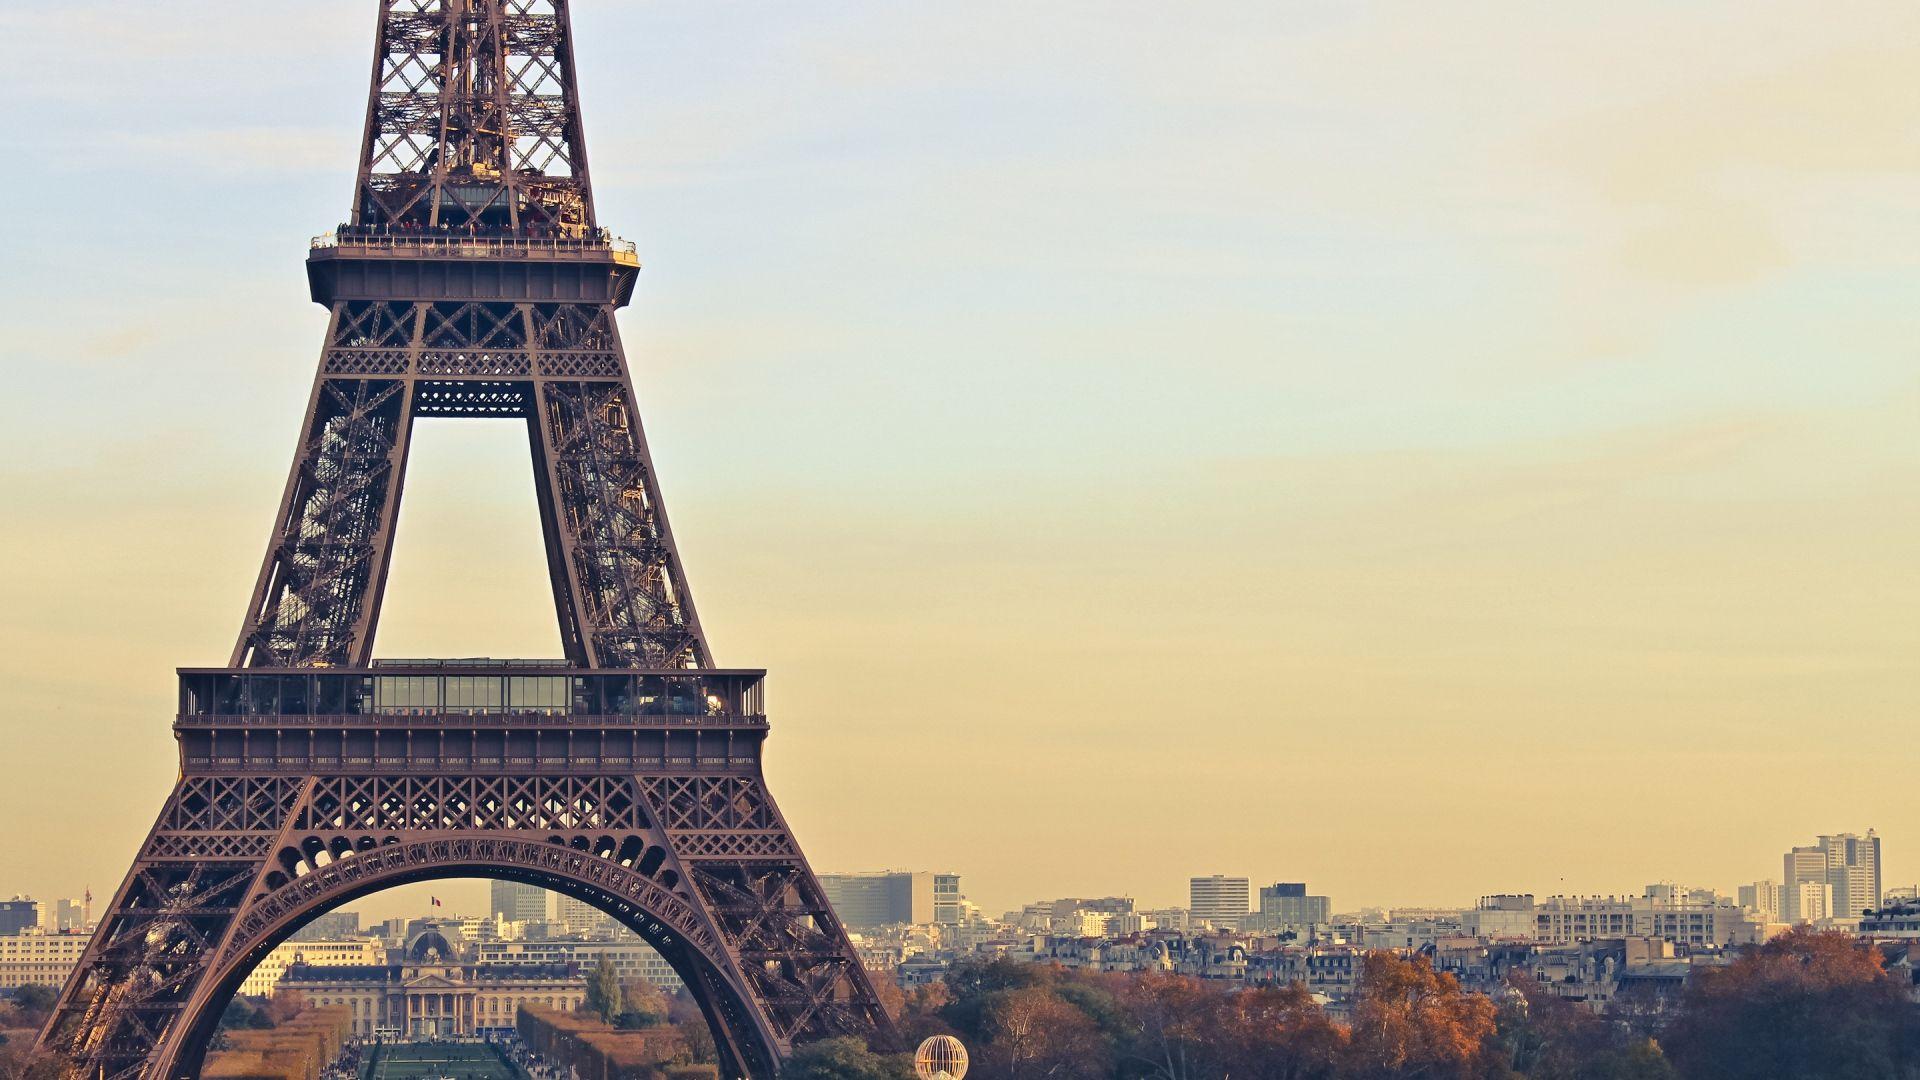 Download Wallpaper 1920x1080 Paris France Eiffel Tower Full Hd 1080p Hd Background Paris Background Retina Wallpaper Eiffel Tower Pictures Full hd eiffel tower wallpaper hd 1080p